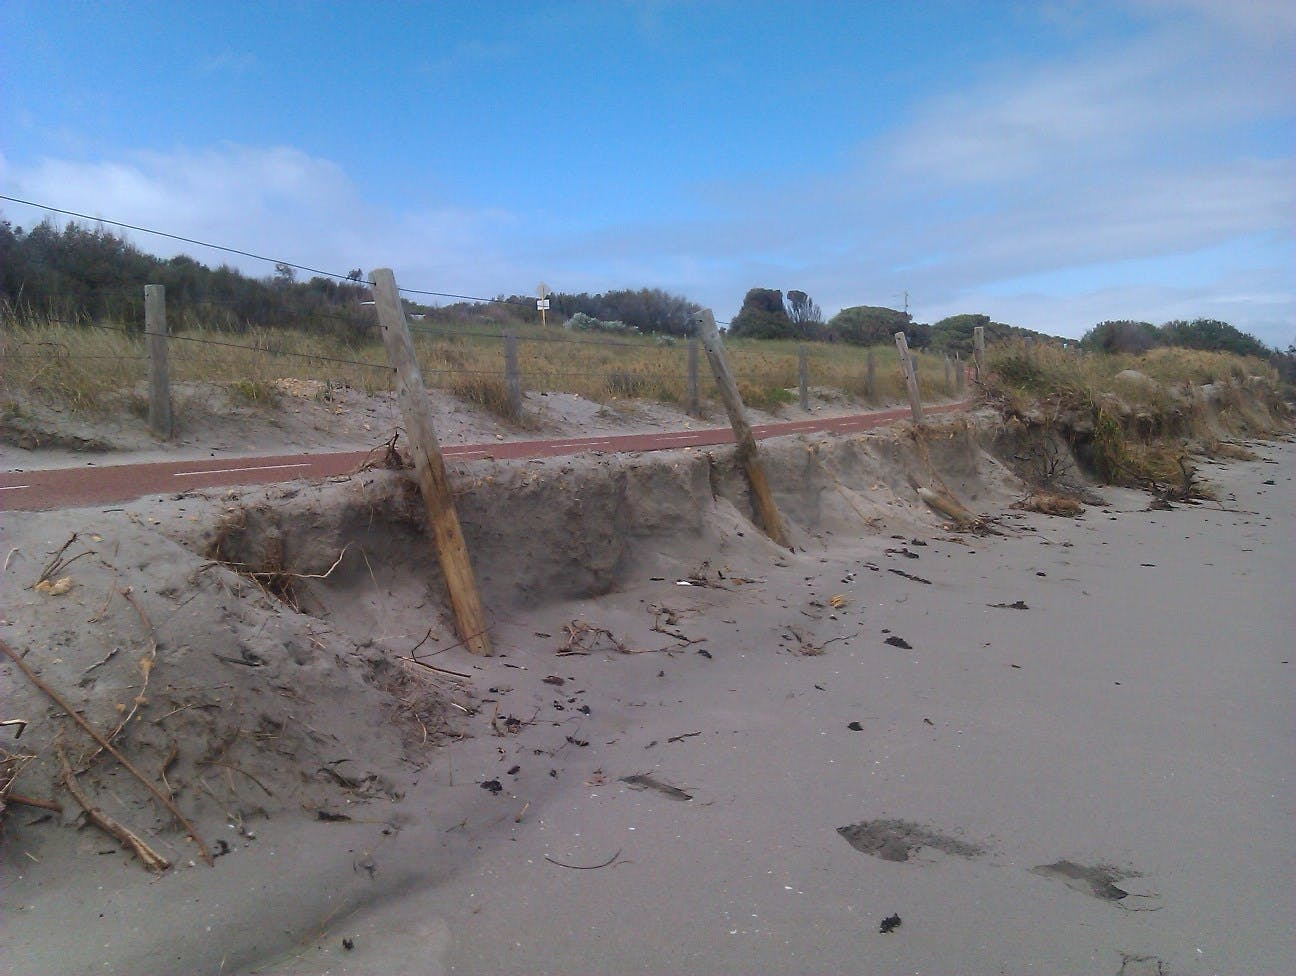 2013 - Erosion at Shared Path